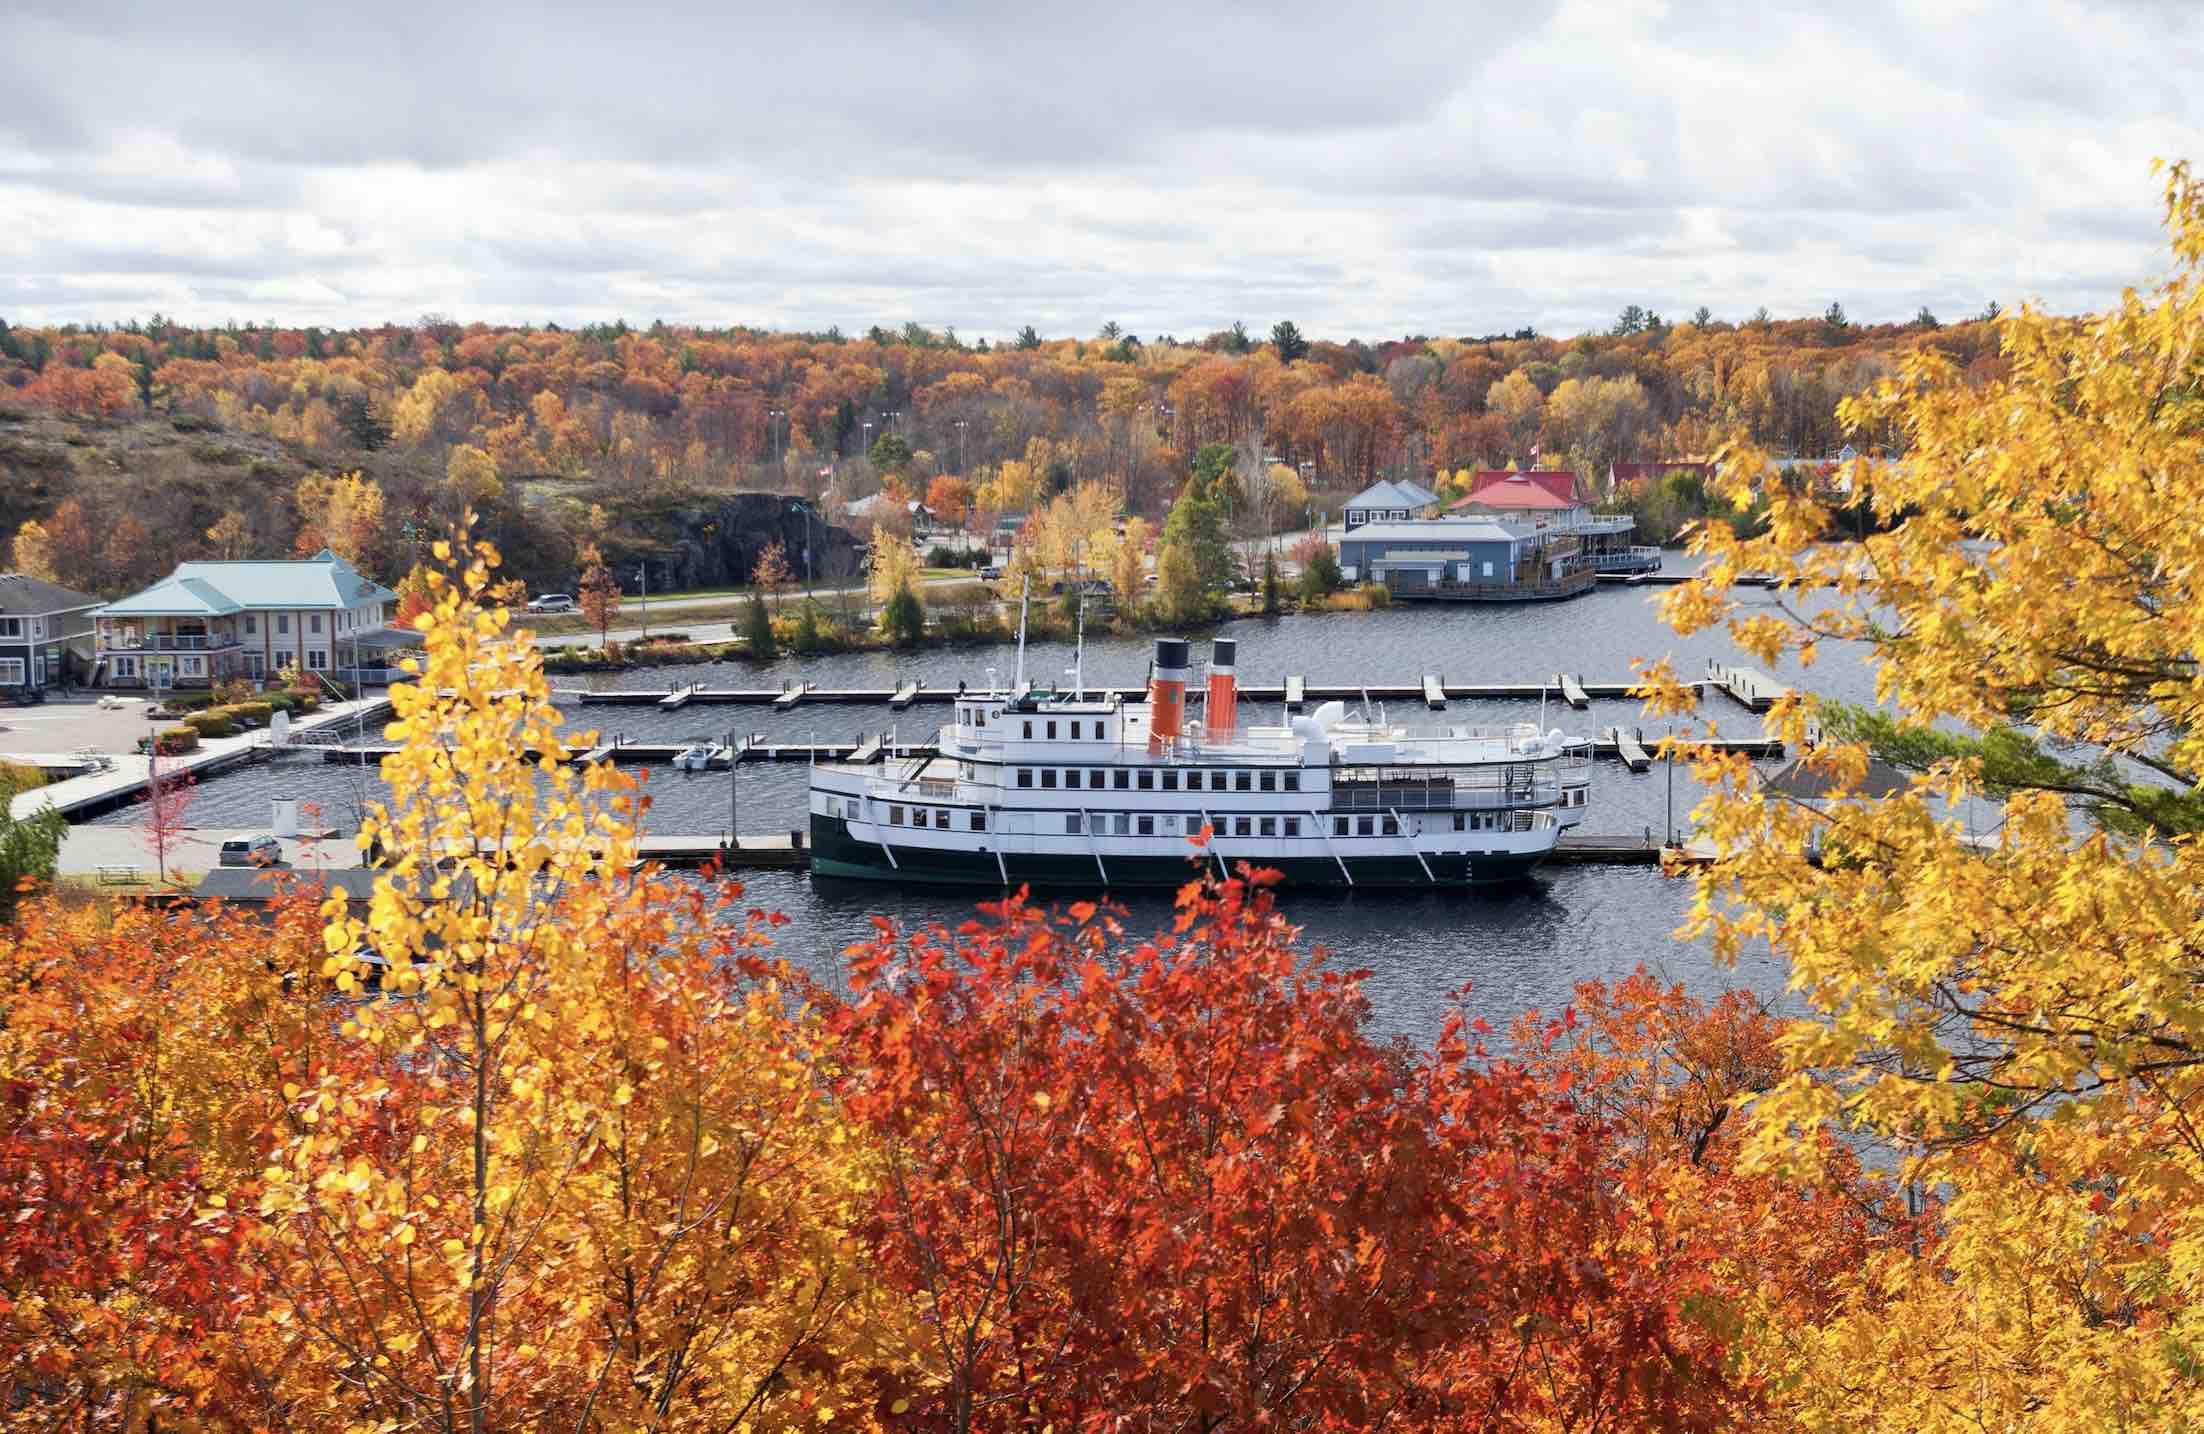 Muskoka Wharf in Fall with steamships-cool885-Shutterstock - living in Gravenhurst Ontario